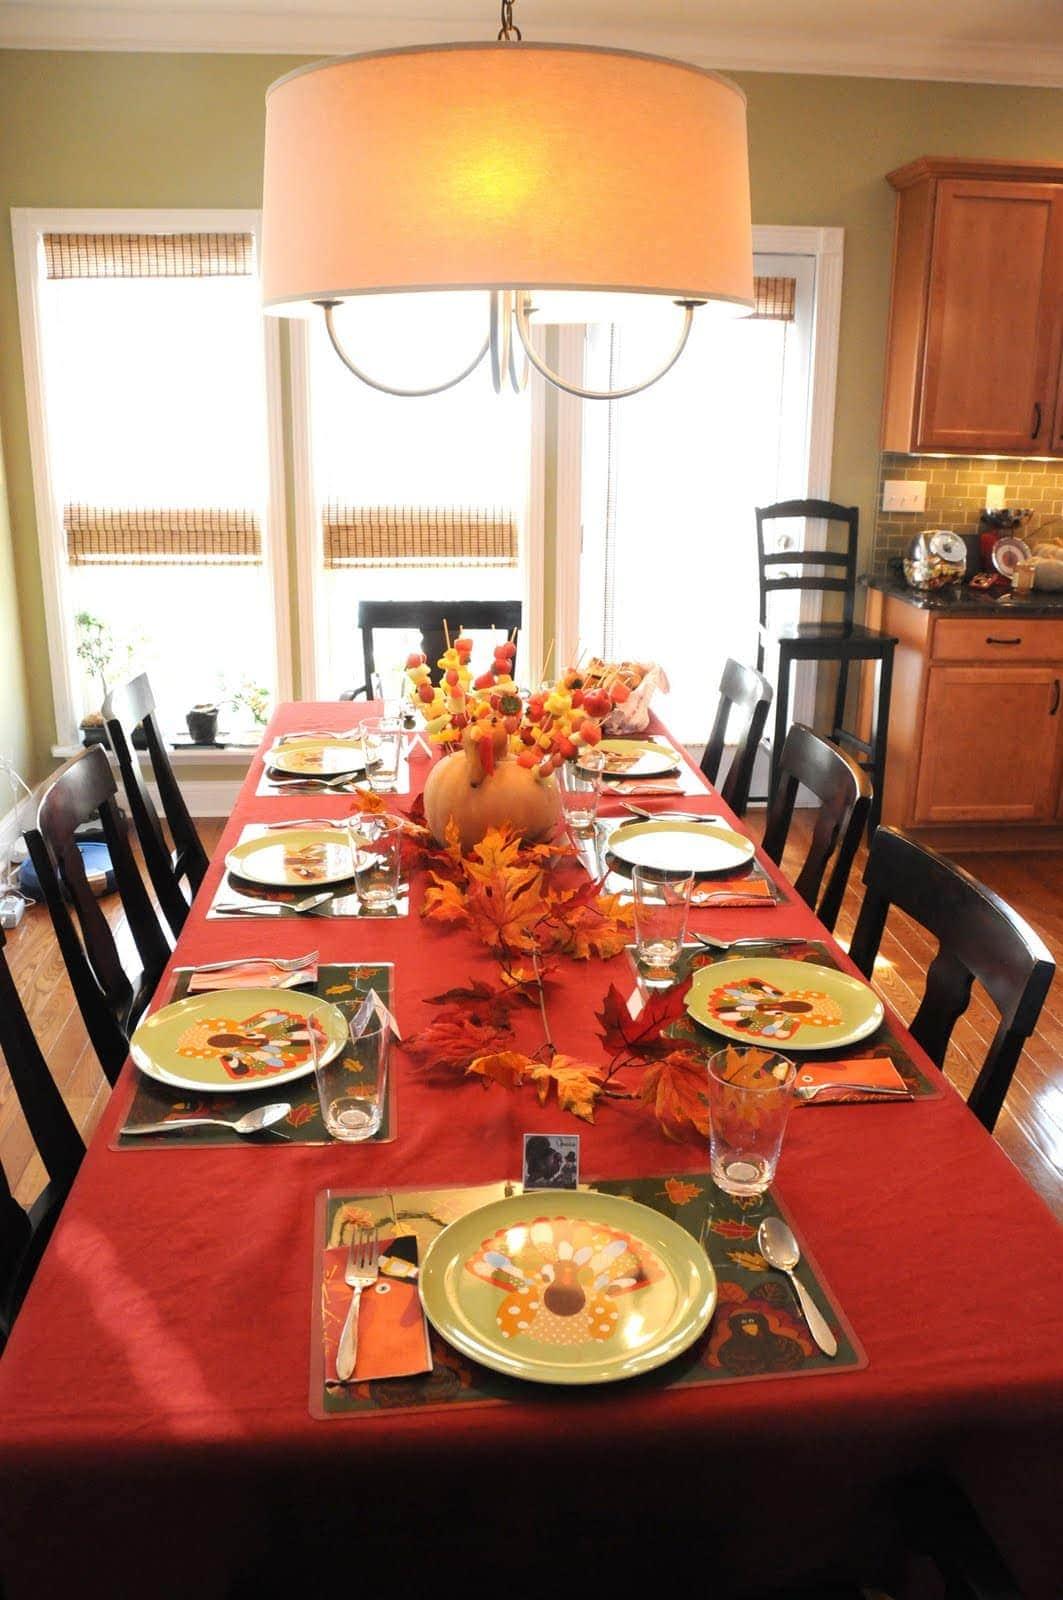 Thanksgiving Decor The Polkadot Chair